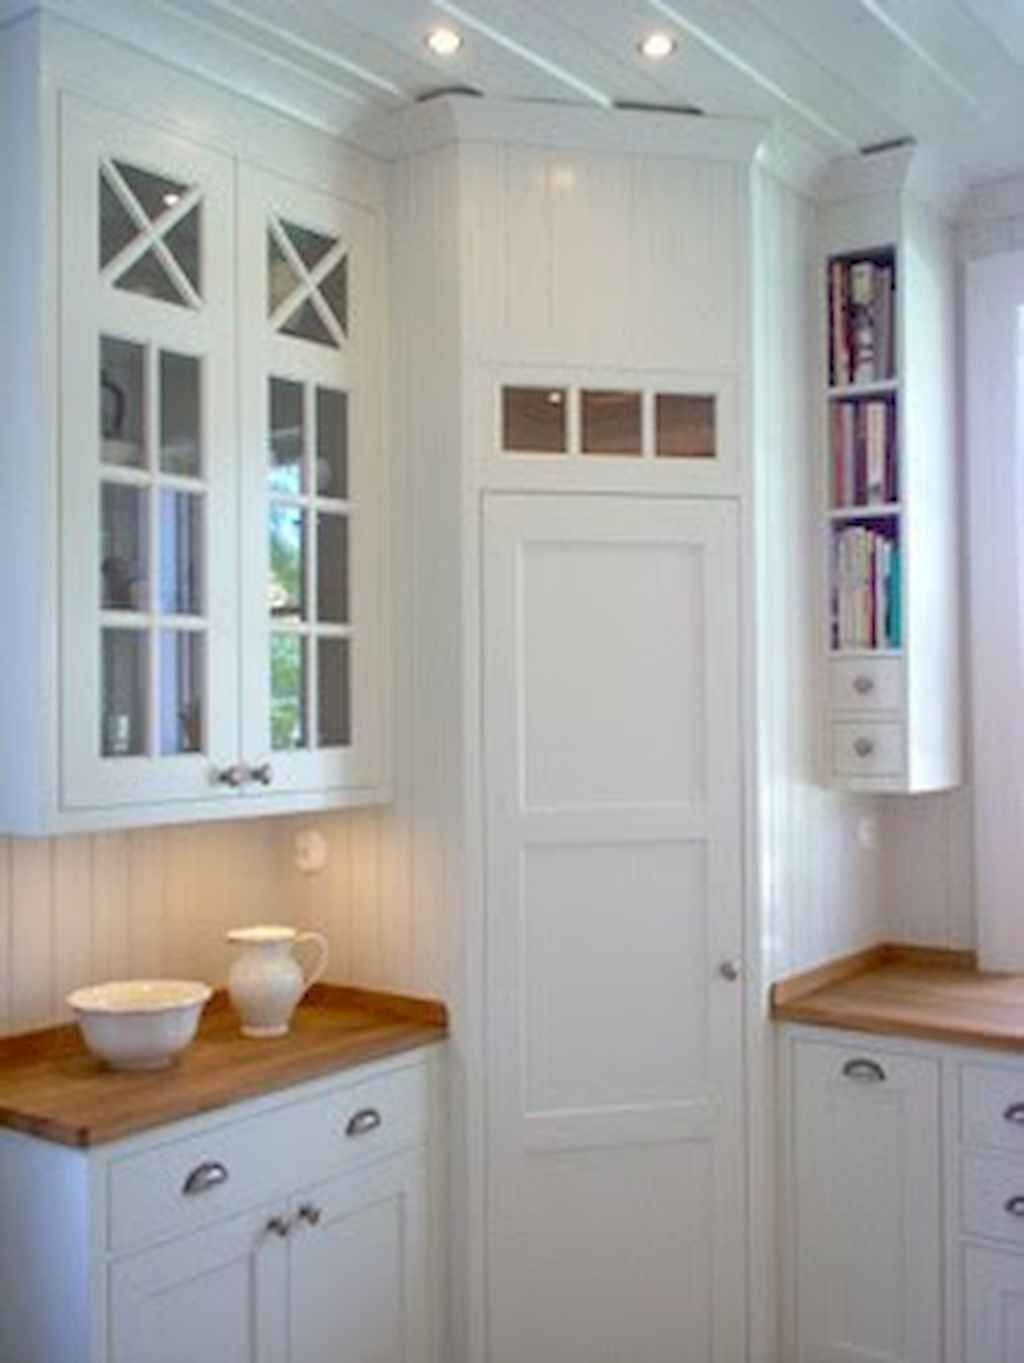 60 Glamorous Scandinavian Kitchen Decor Ideas 7 Corner Kitchen Cabinet Corner Pantry Cabinet Kitchen Cabinets